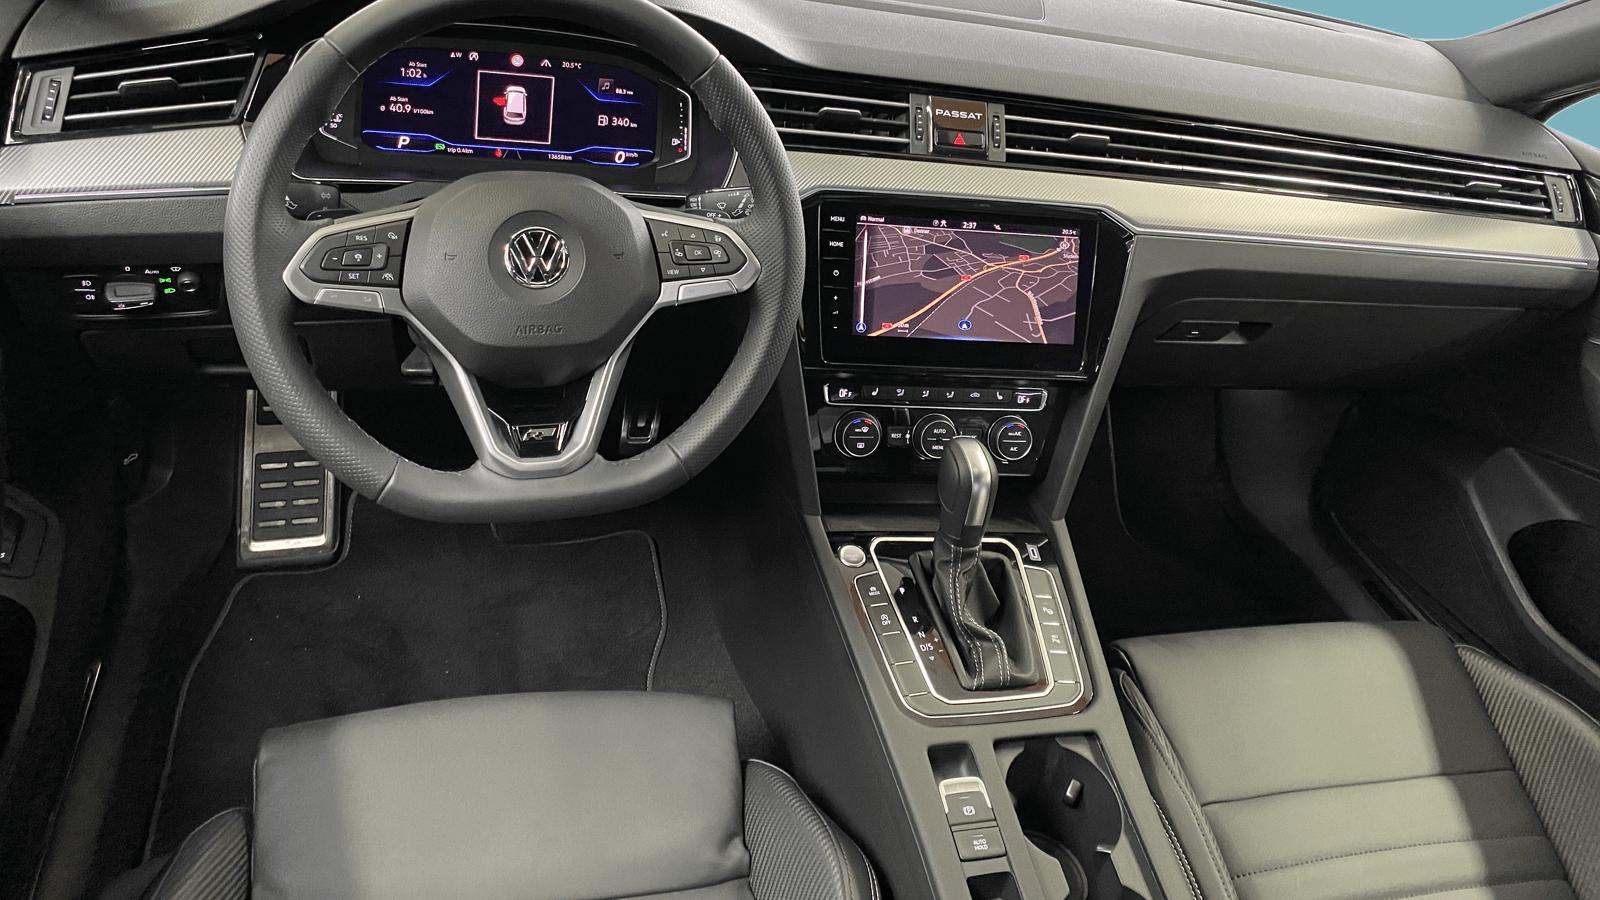 VW Passat Variant Grau interior - Clyde Auto-Abo